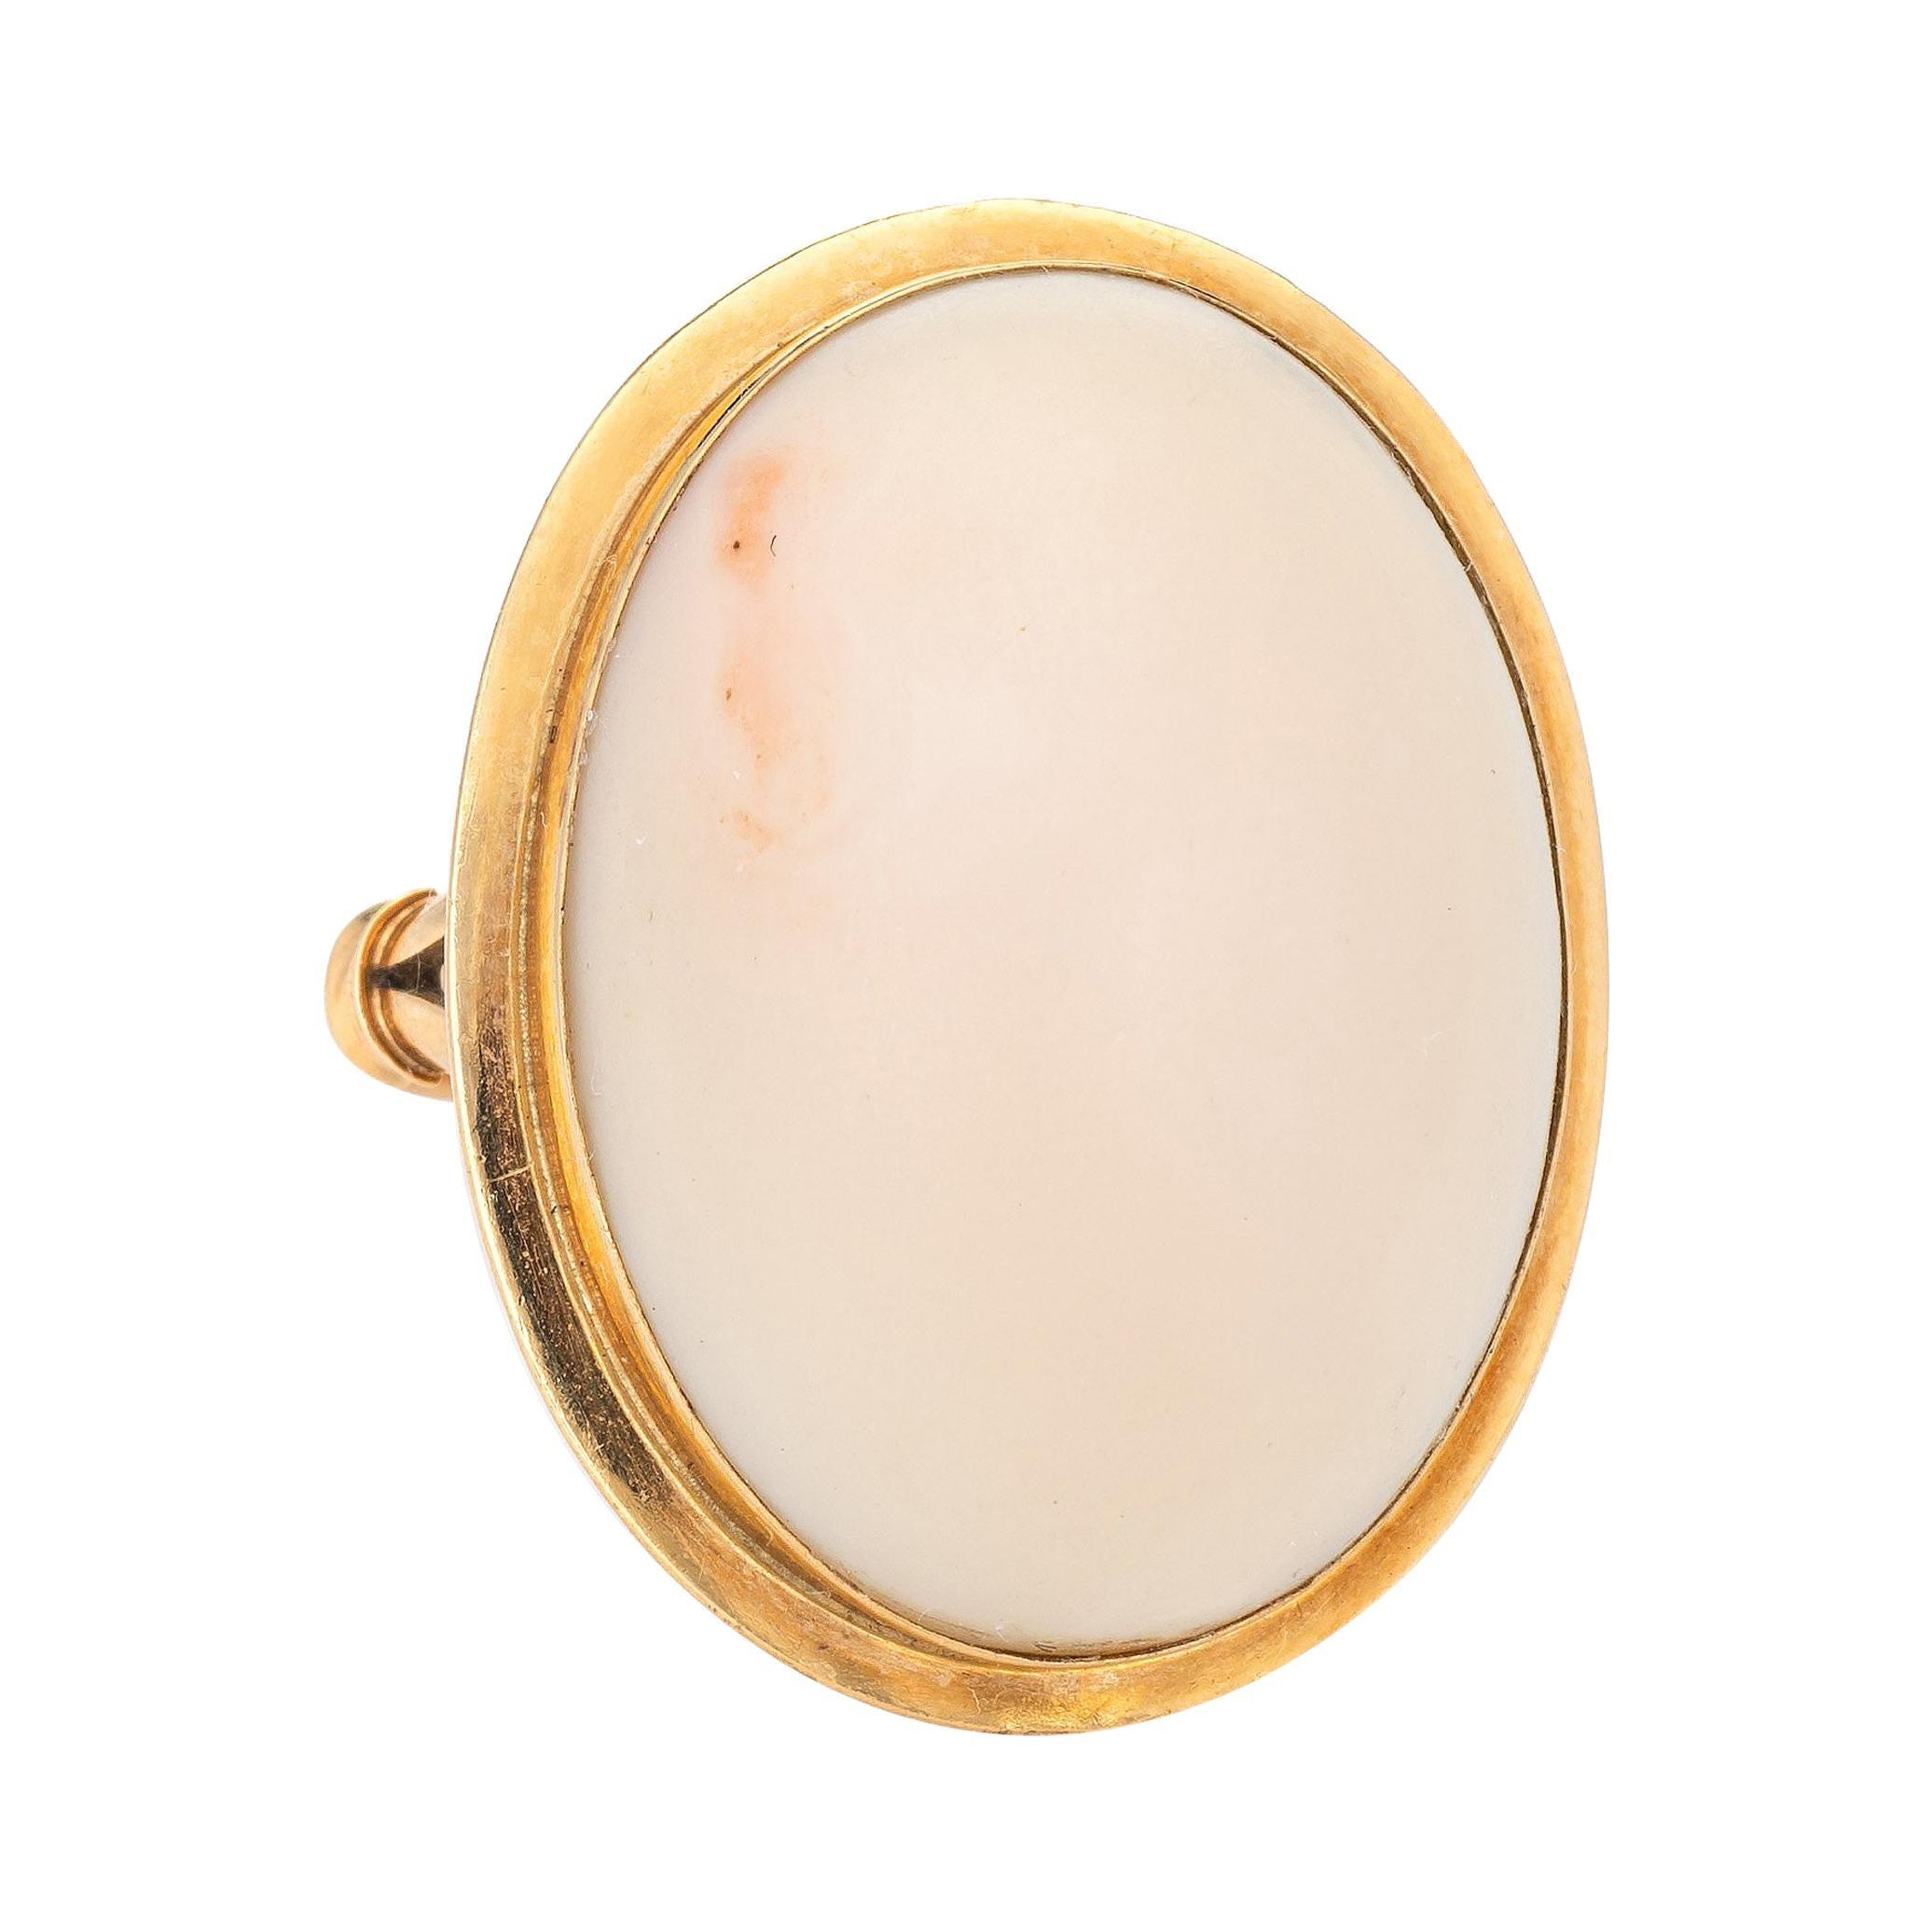 Angel Skin Coral Ring Vintage 18k Gold Large Oval Cocktail Jewelry Estate